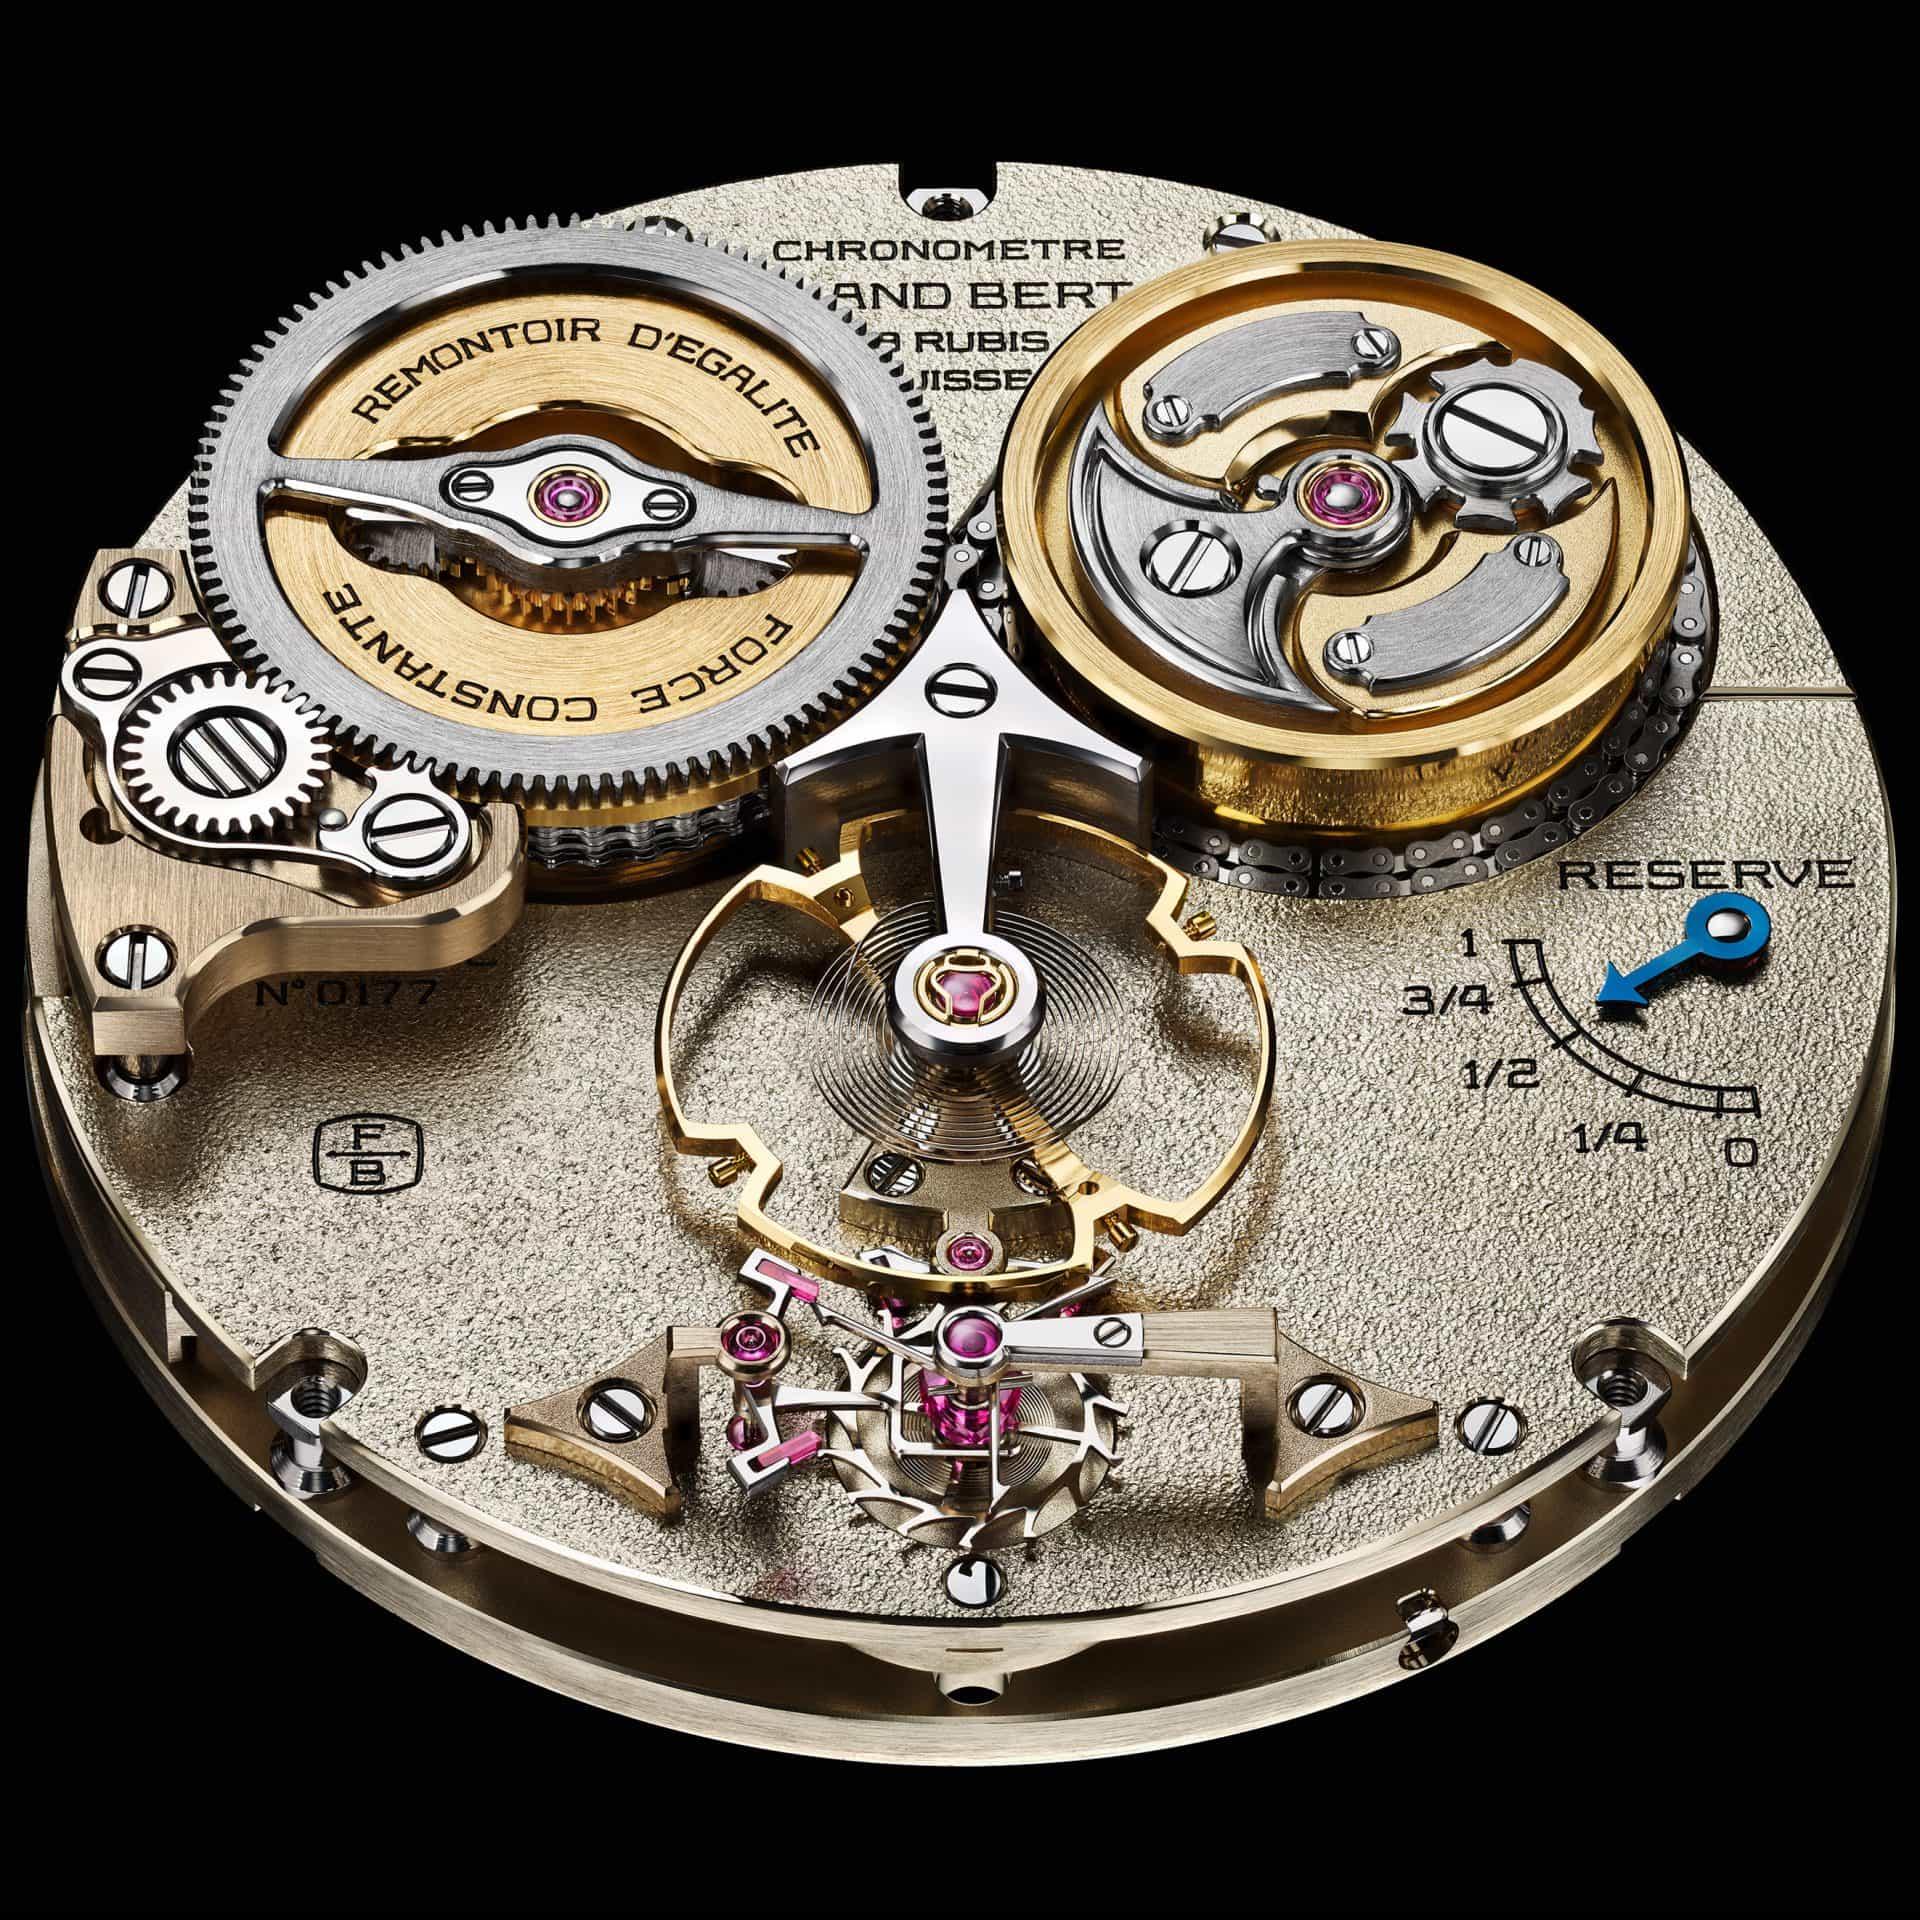 Kaliber der Ferdinand Berthoud Chronometrie FB 2RE.2